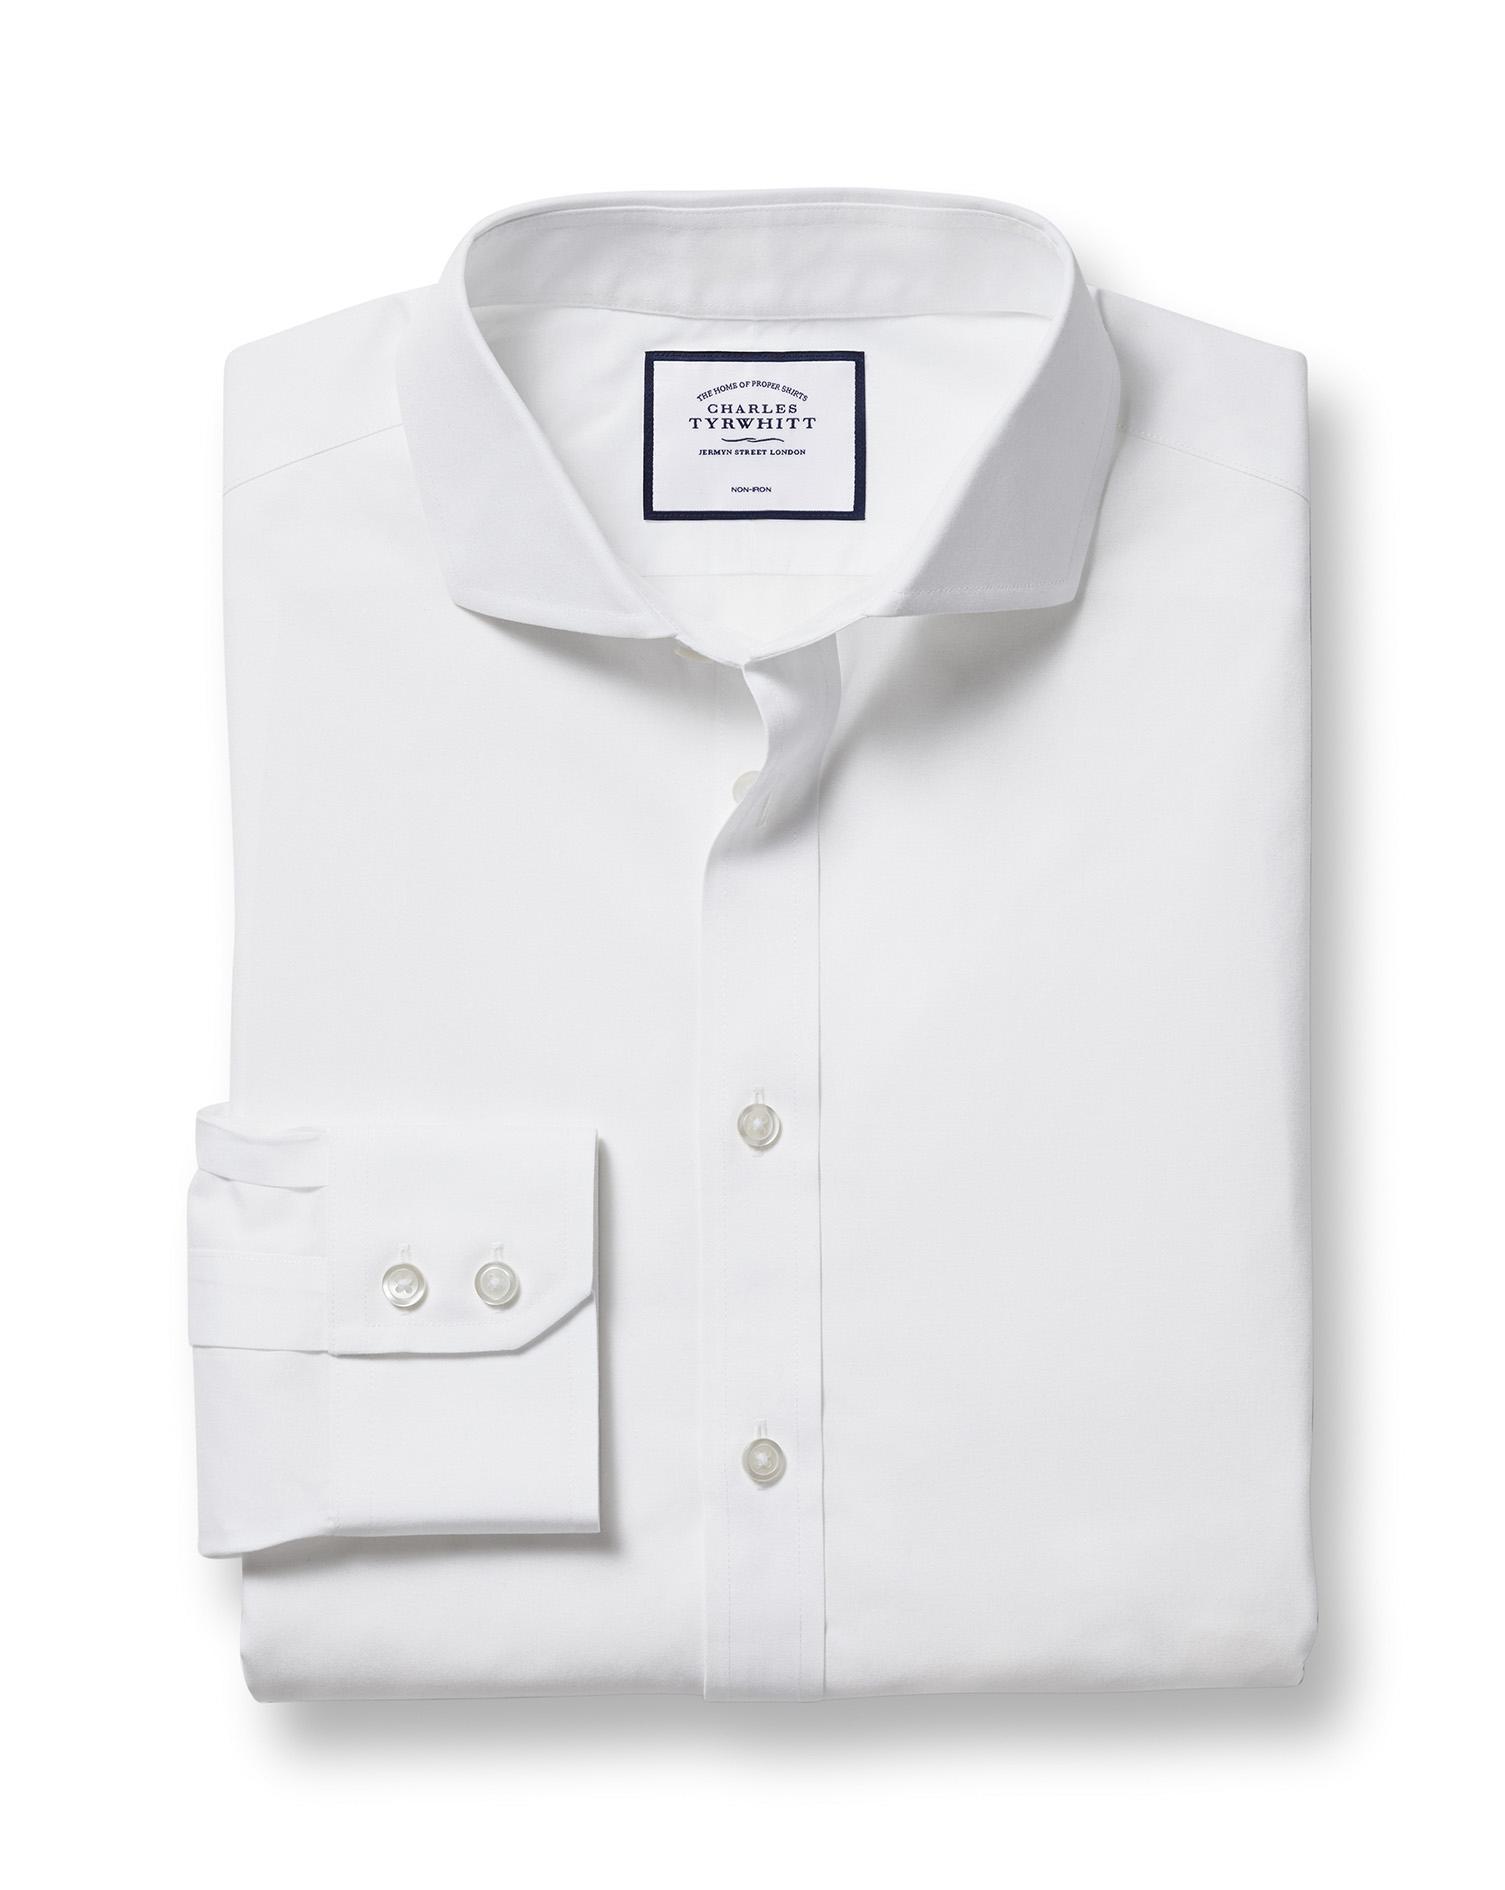 Classic Fit White Non-Iron Poplin Cutaway Collar Cotton Formal Shirt Single Cuff Size 17.5/35 by Cha